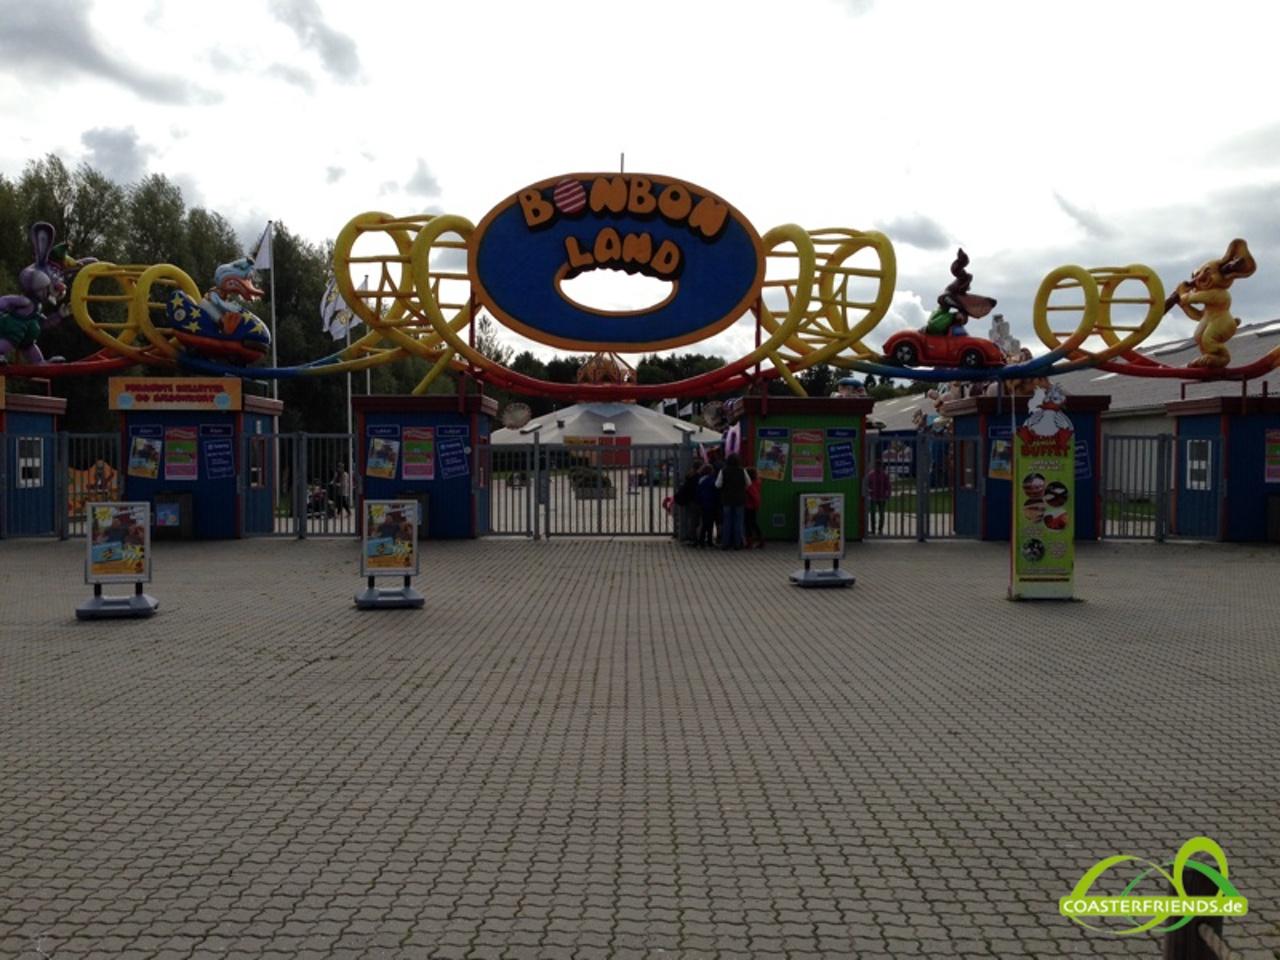 Europa - https://coasterfriends.de/joomla//images/pcp_parkdetails/europa/o268_BonBon_Land/content1.jpg